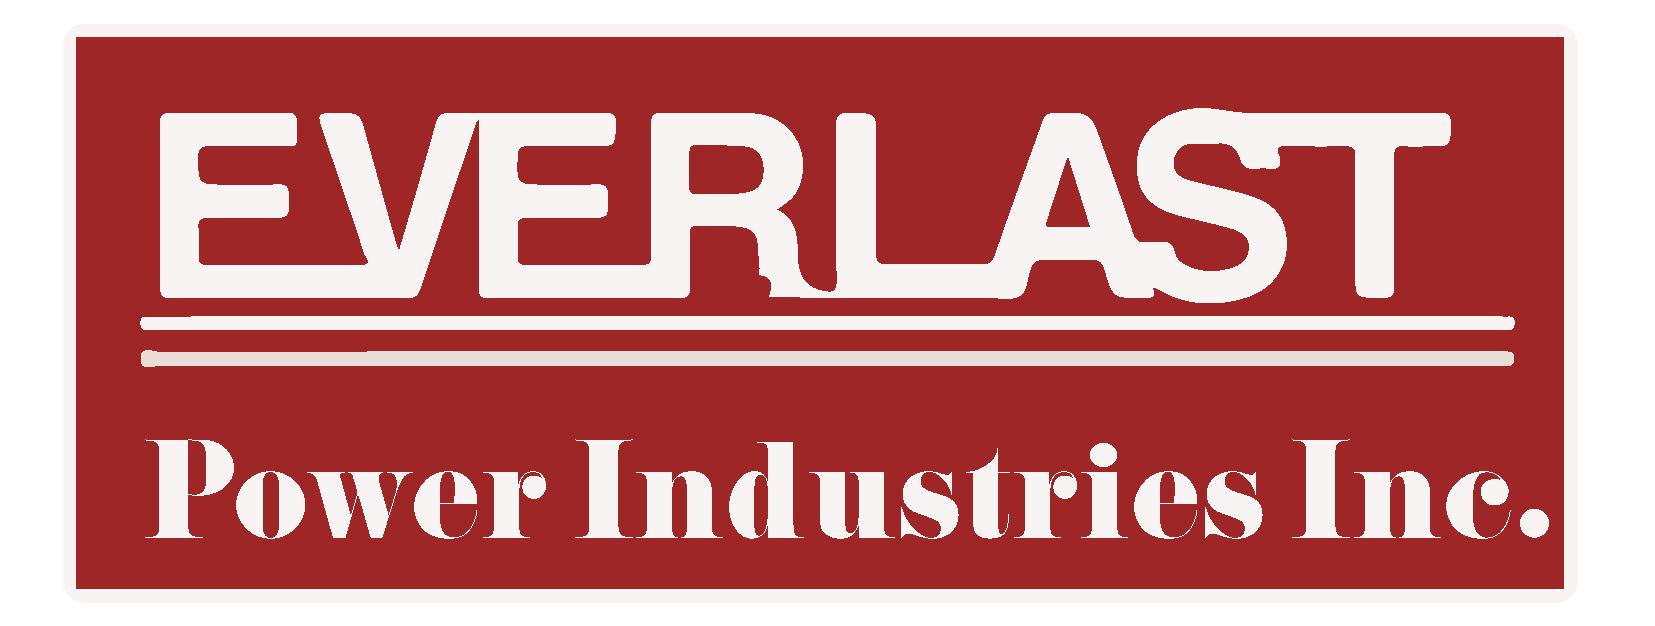 Logo imagenes-02